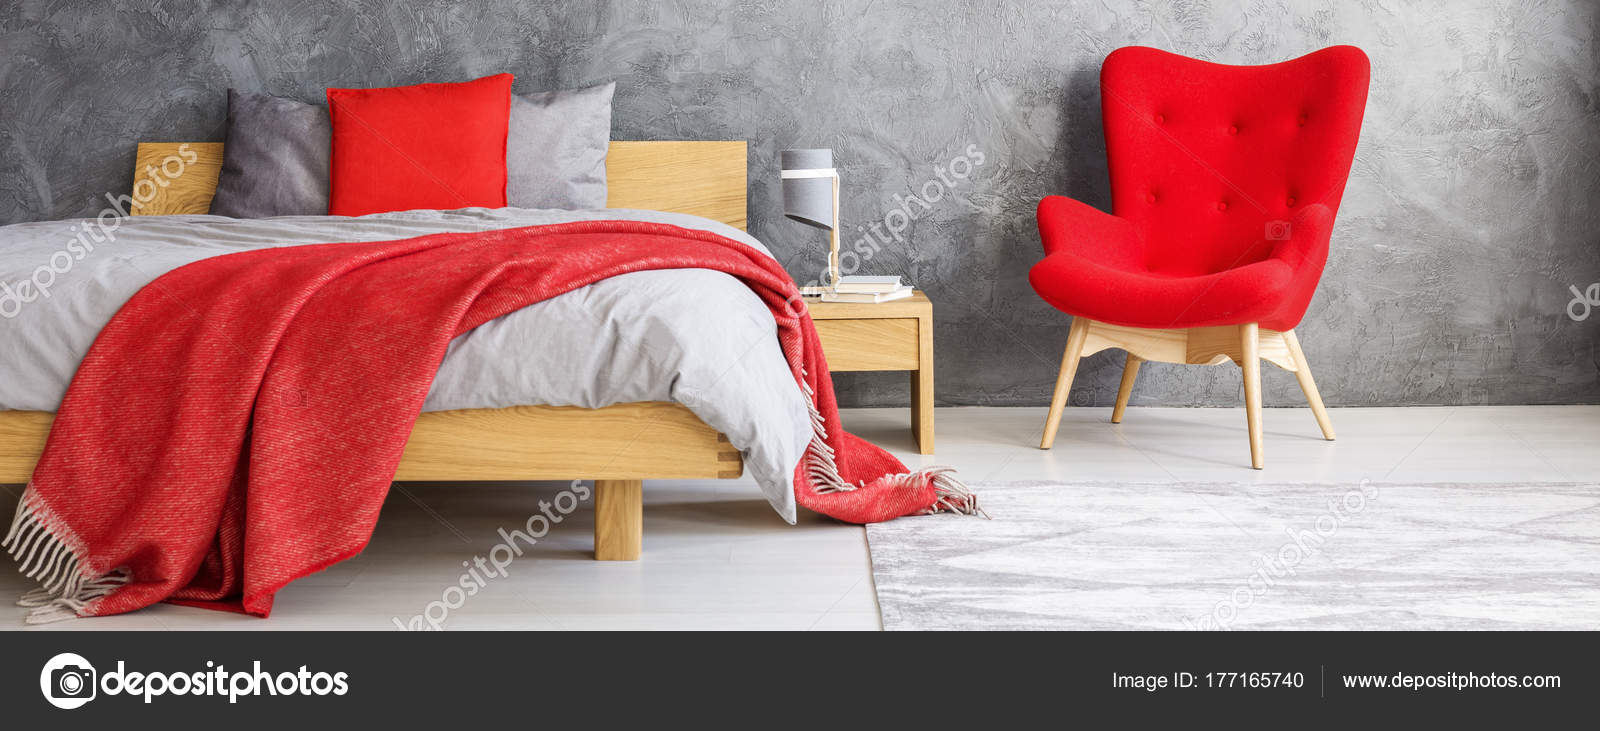 Rode slaapkamer met betonnen wand — Stockfoto © photographee.eu ...